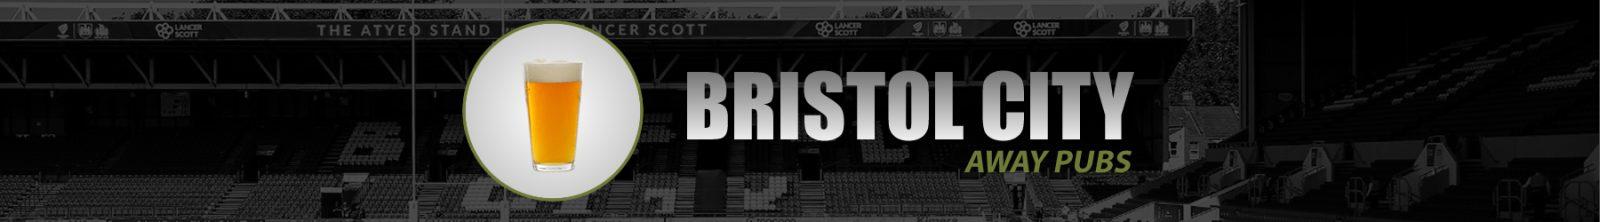 Bristol City Away Pubs